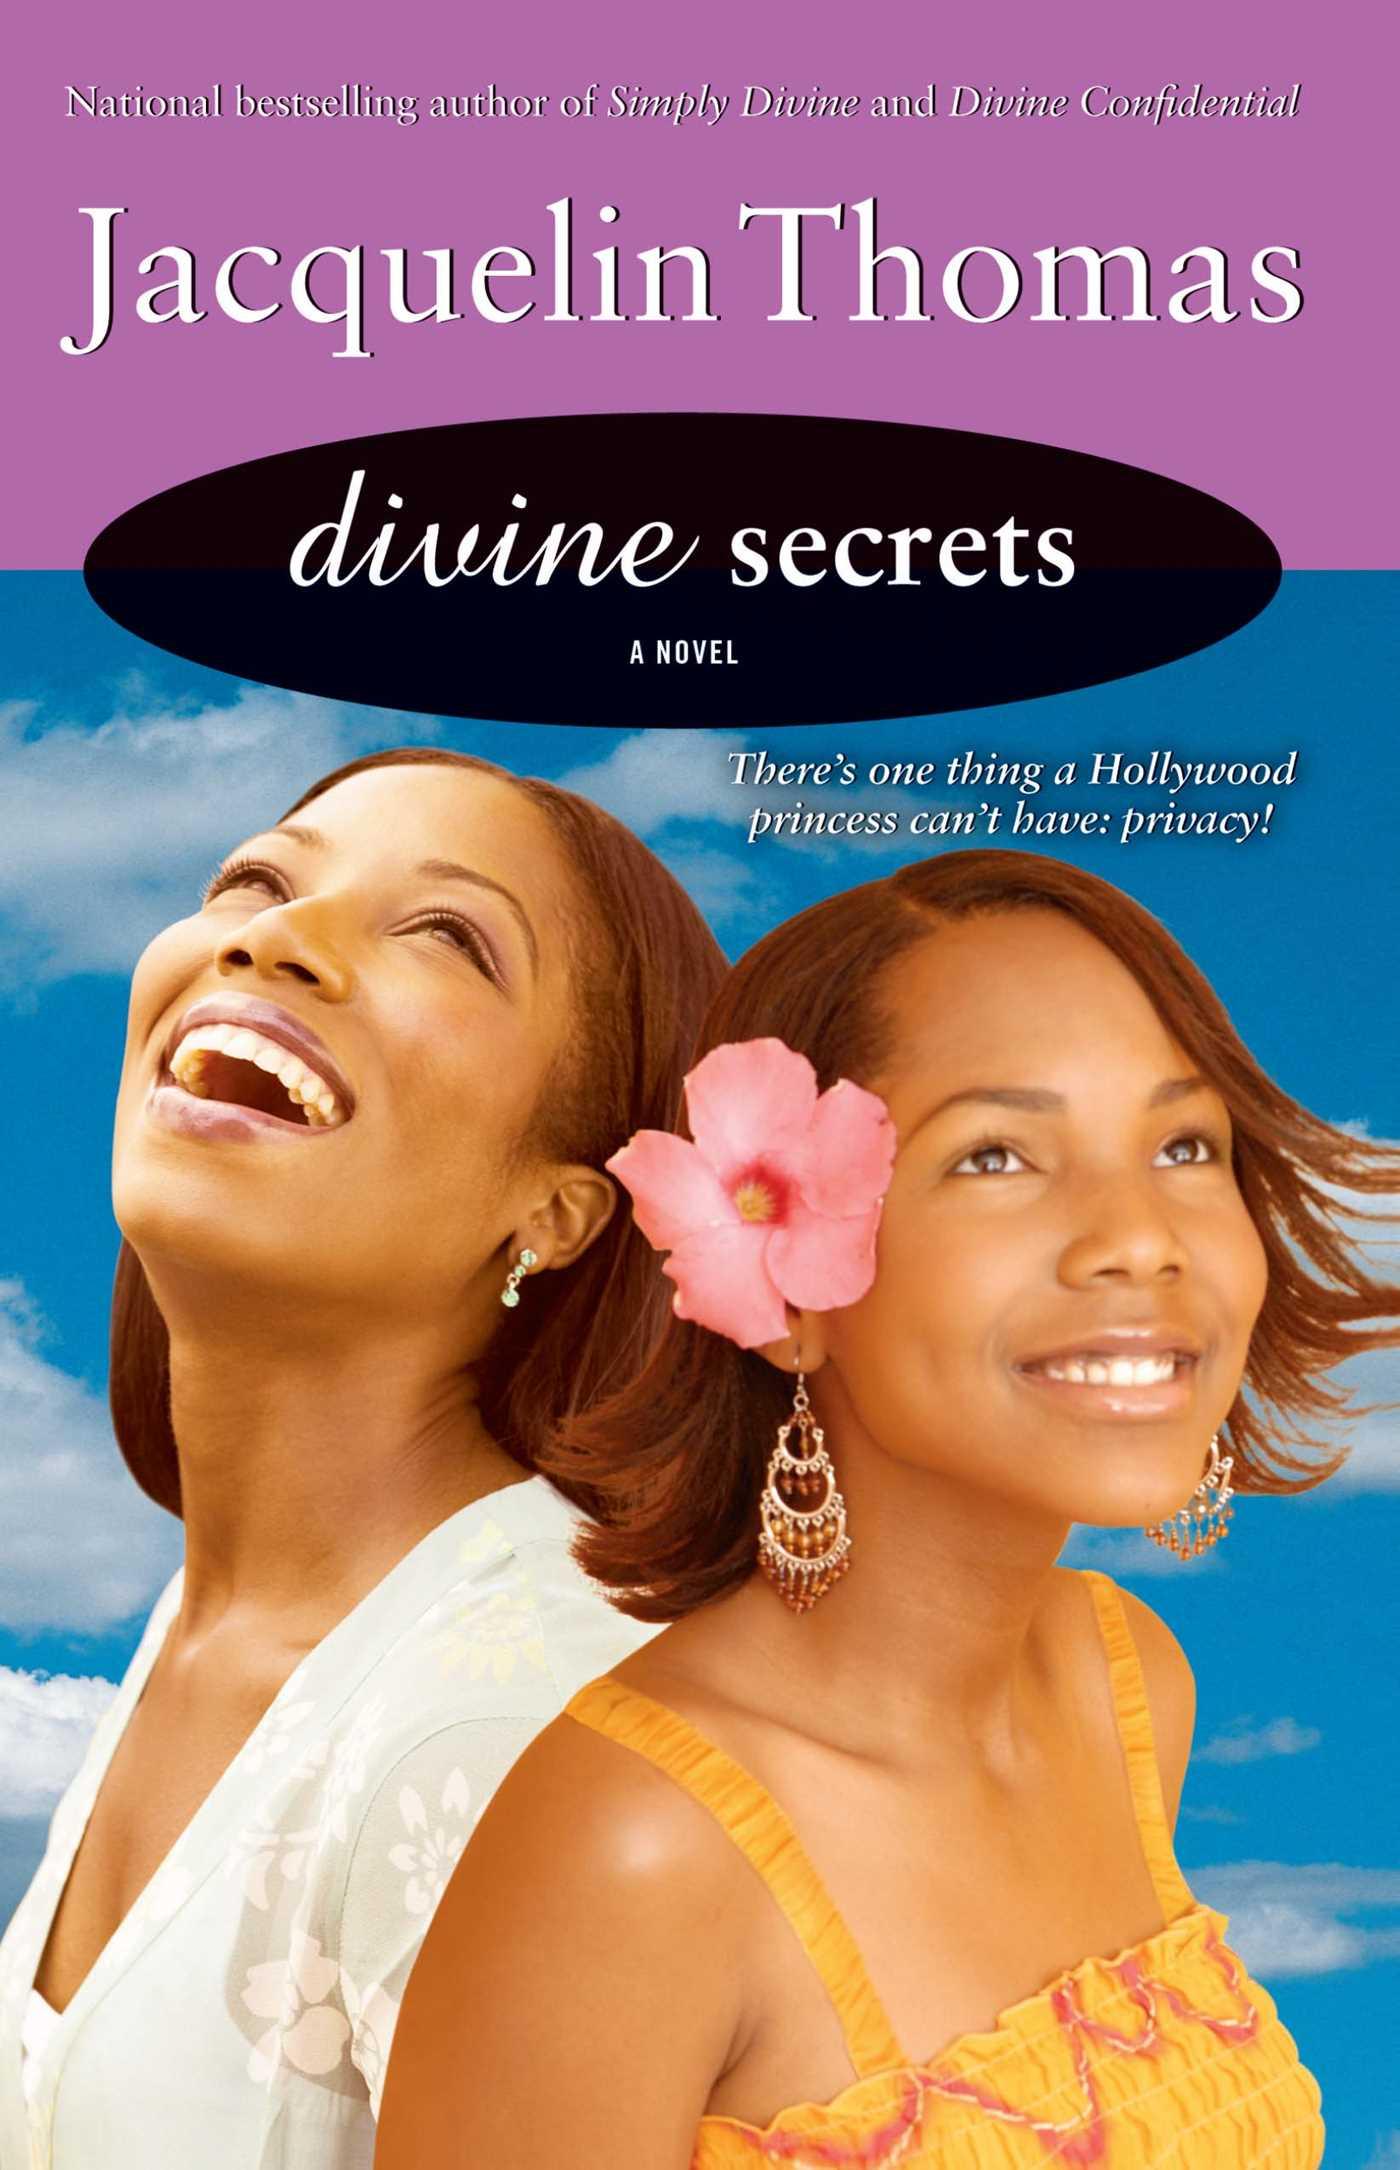 Divine secrets 9781416551447 hr